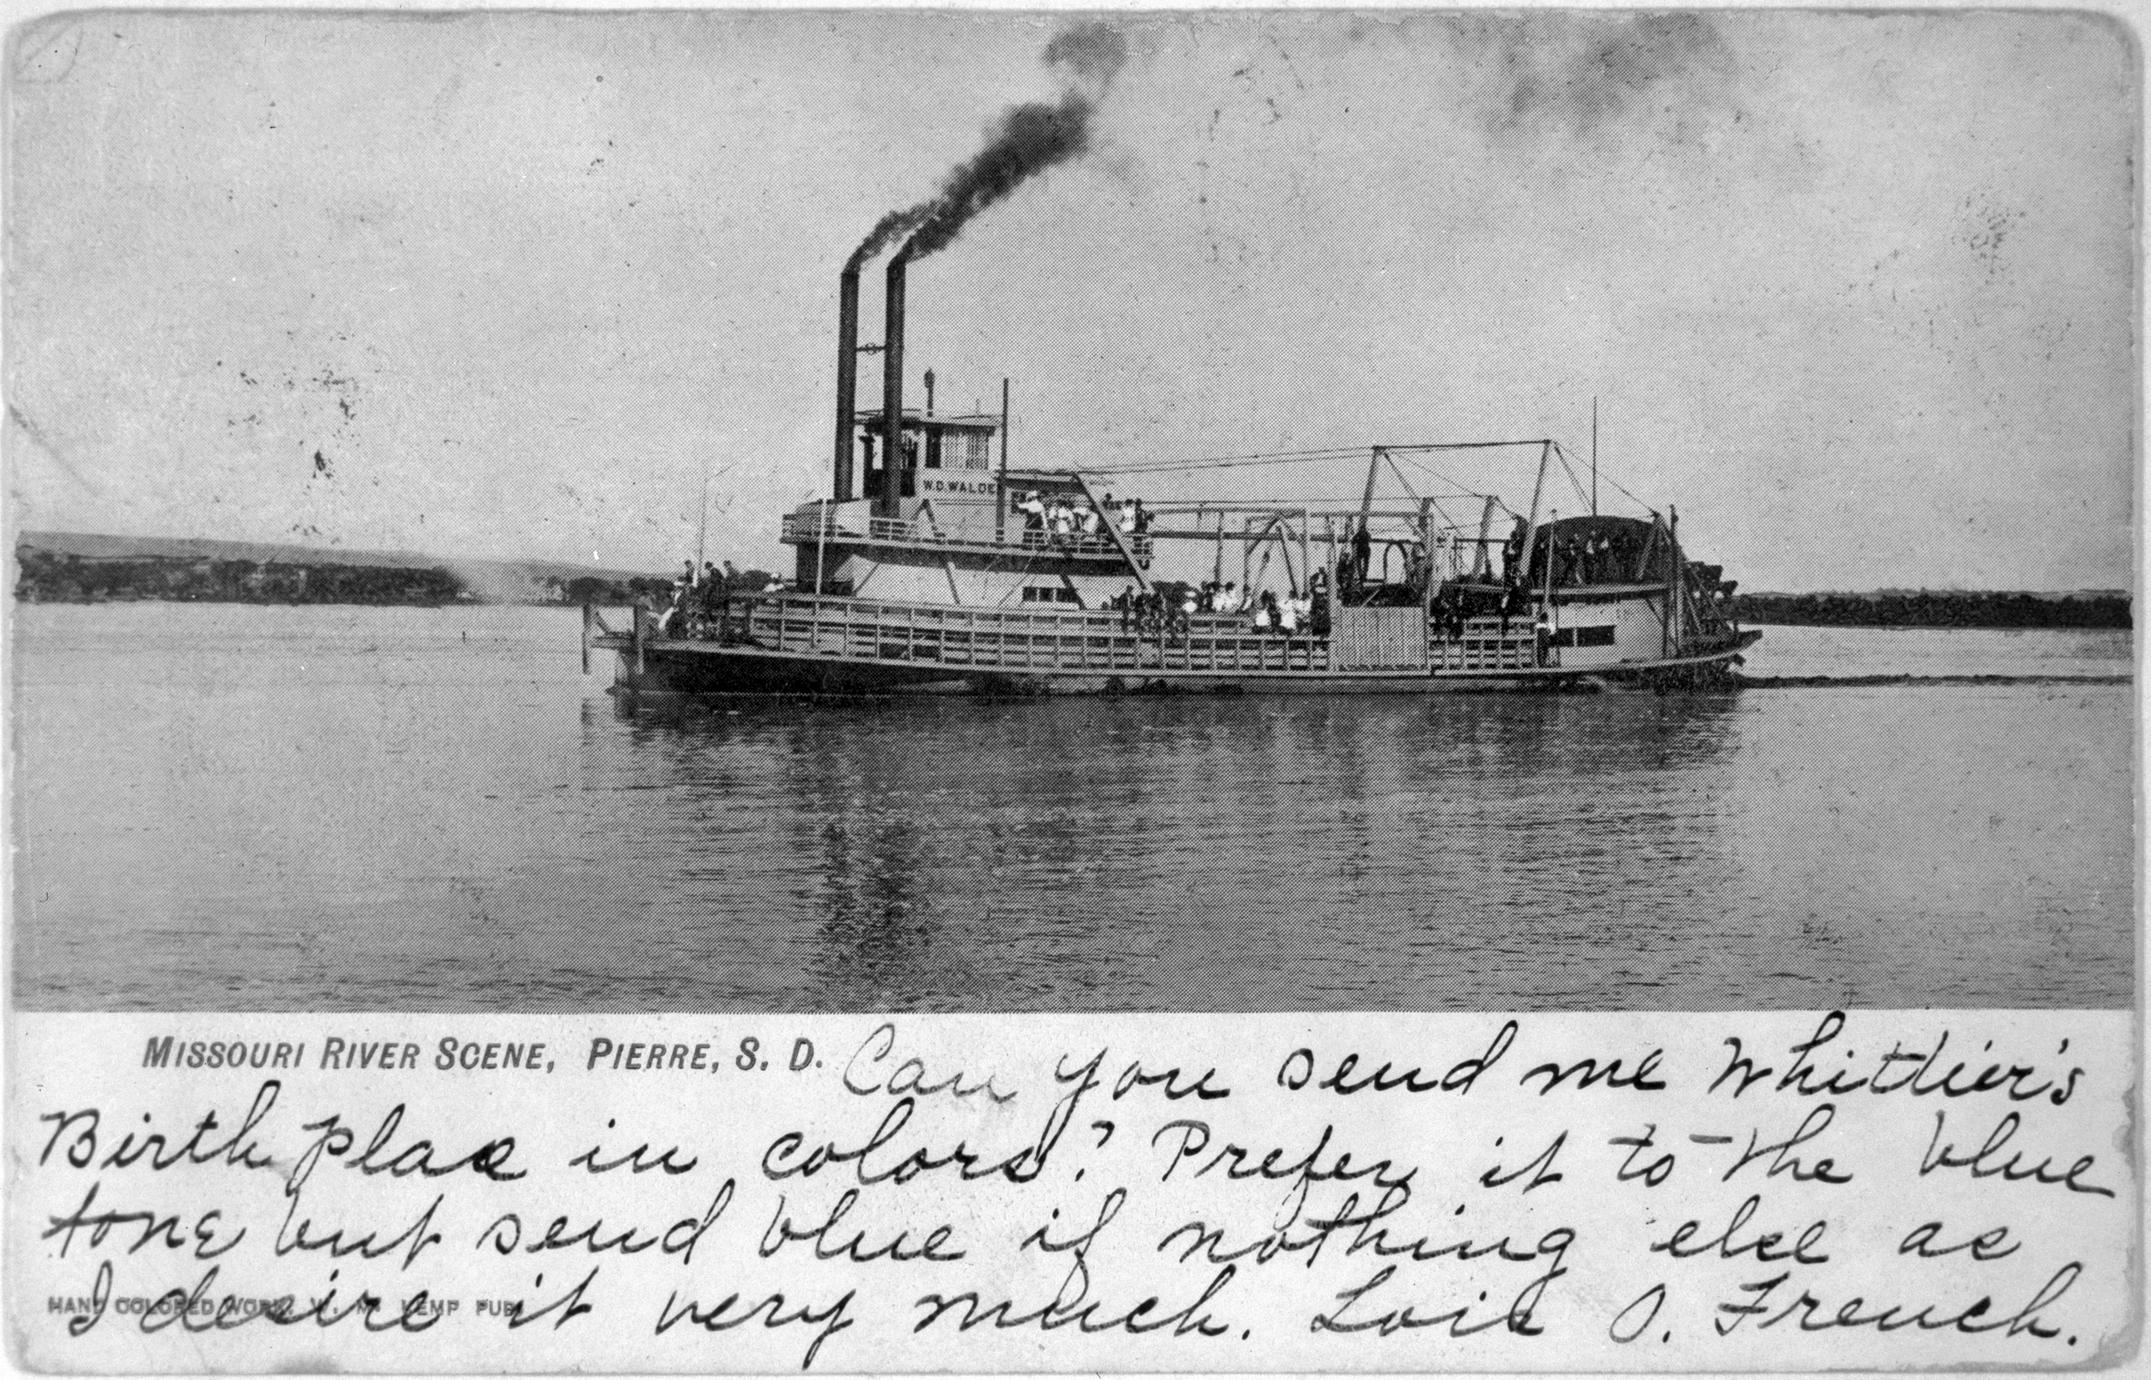 W.D. Walden (Ferry/Tugboat, 1906-ca. 1914/18)